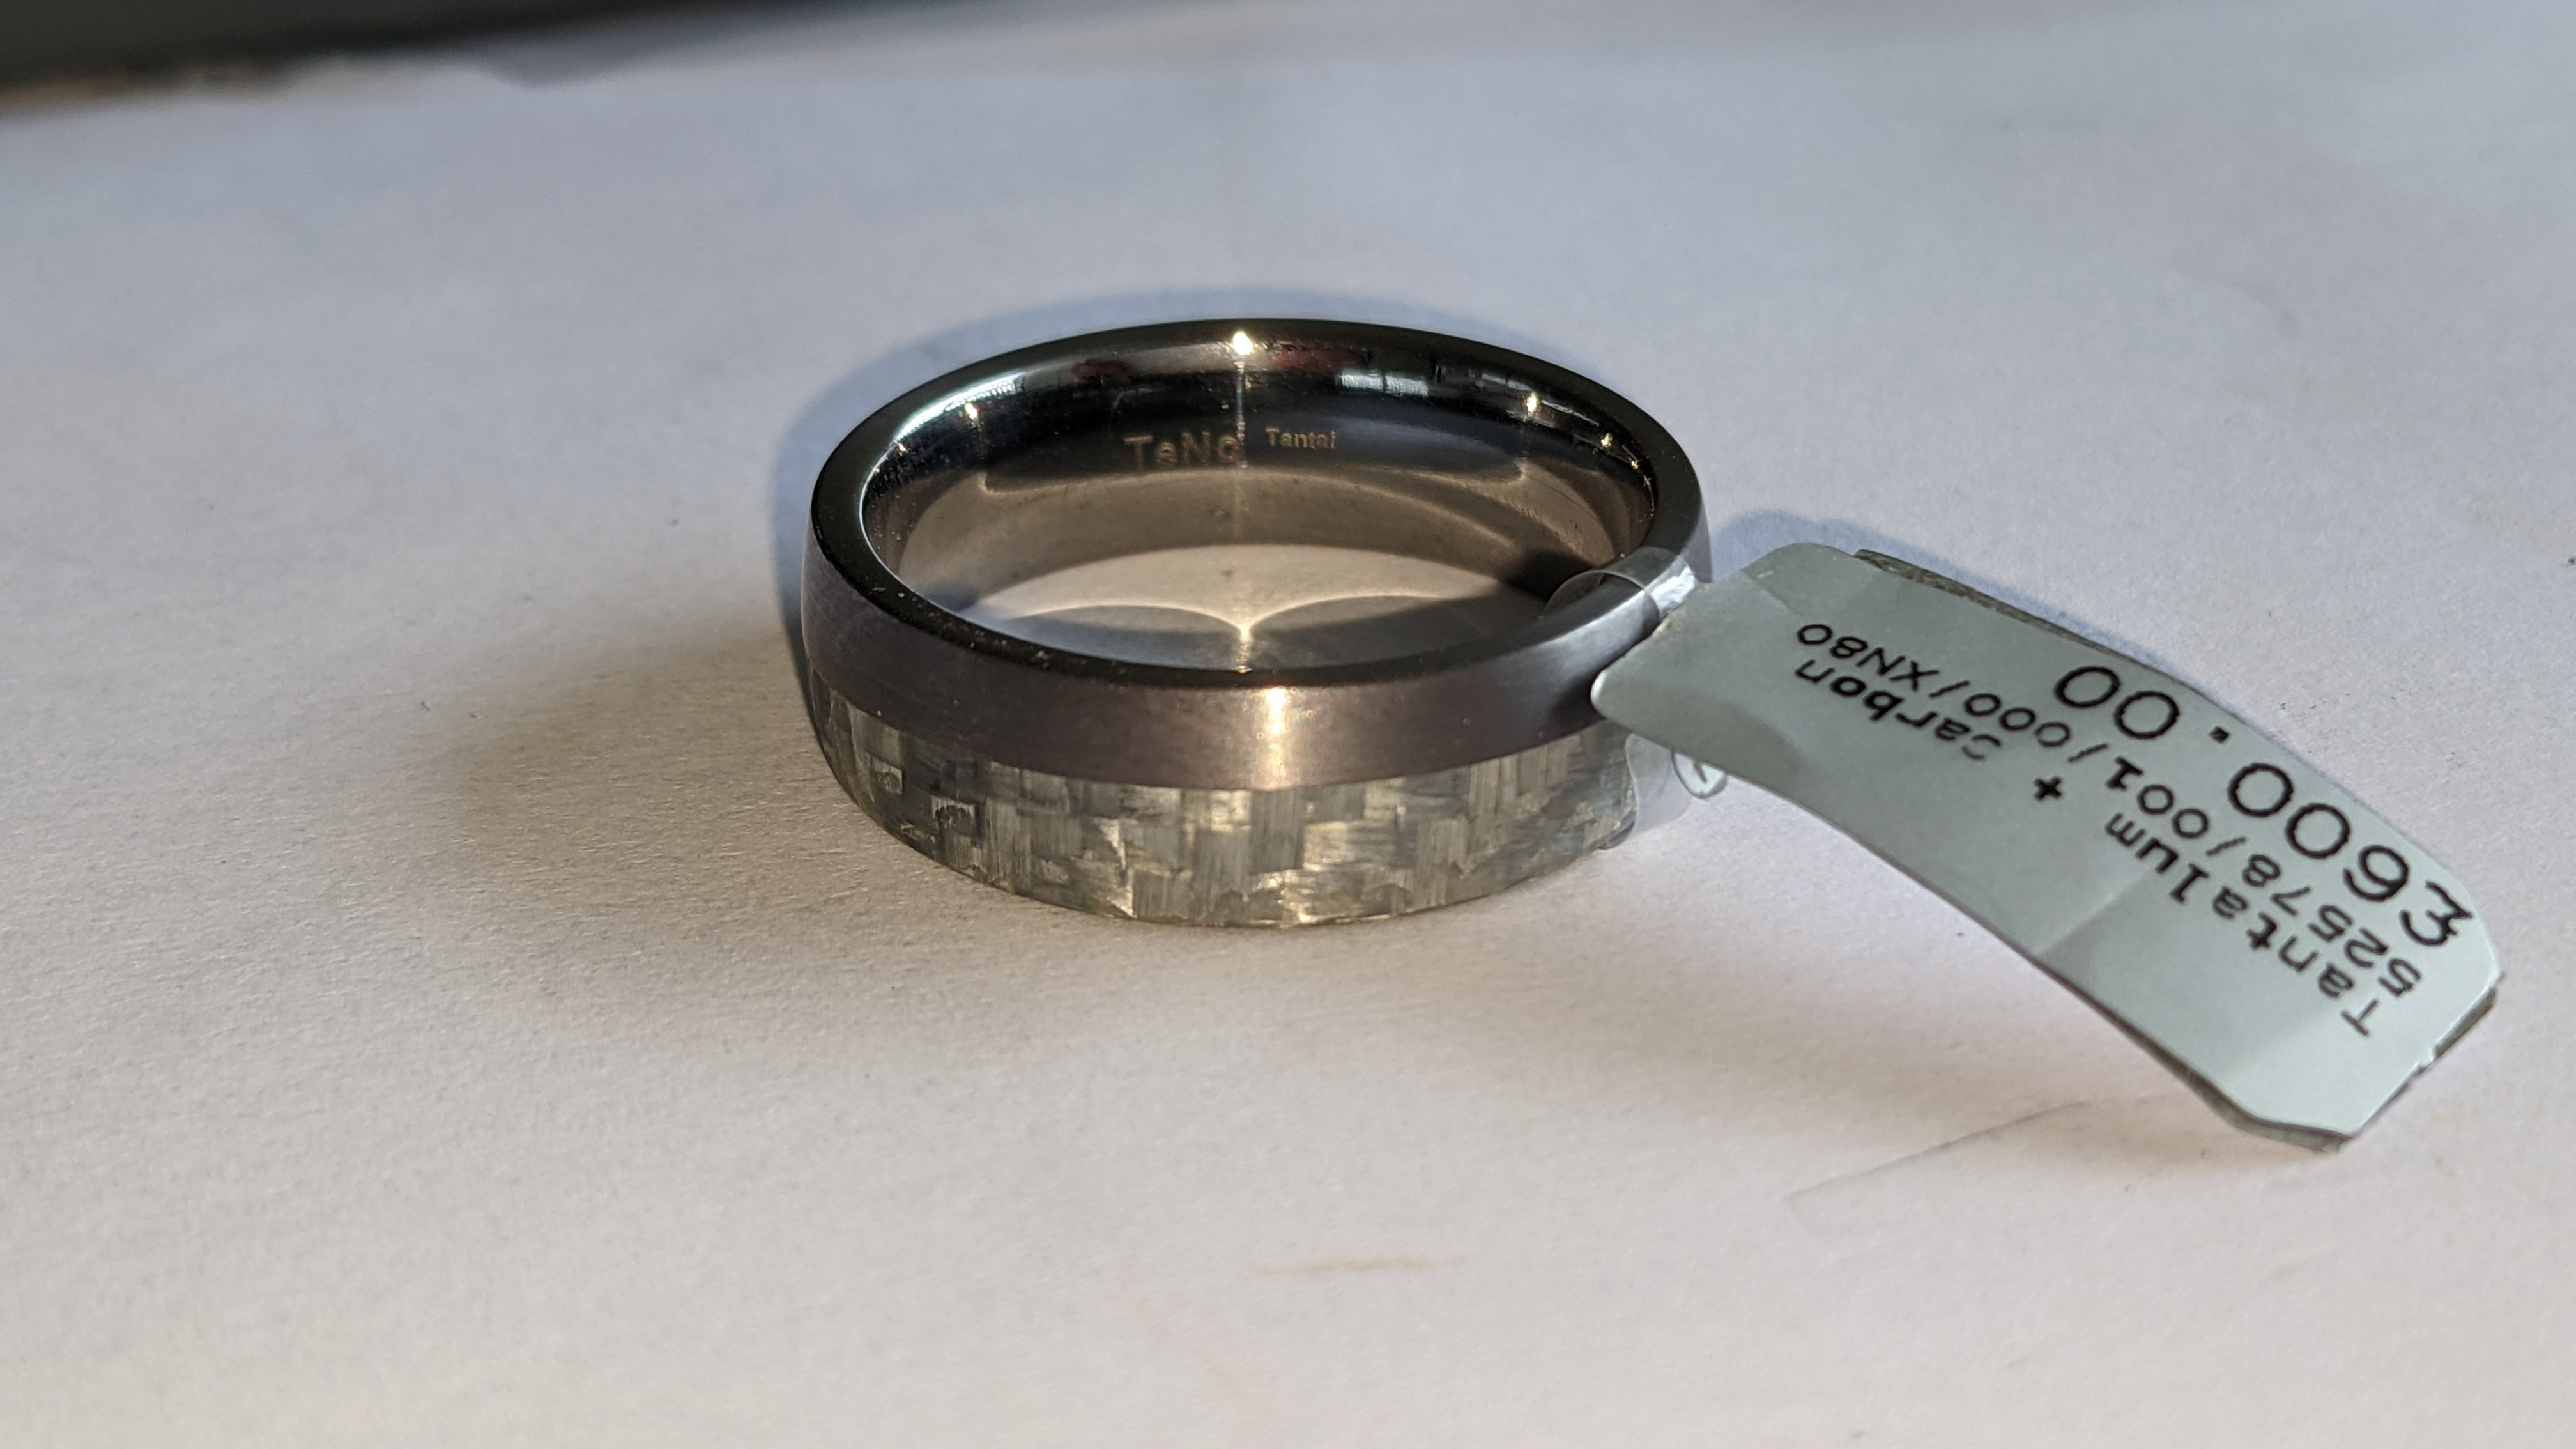 Tantalum & carbon ring RRP £600 - Image 7 of 13